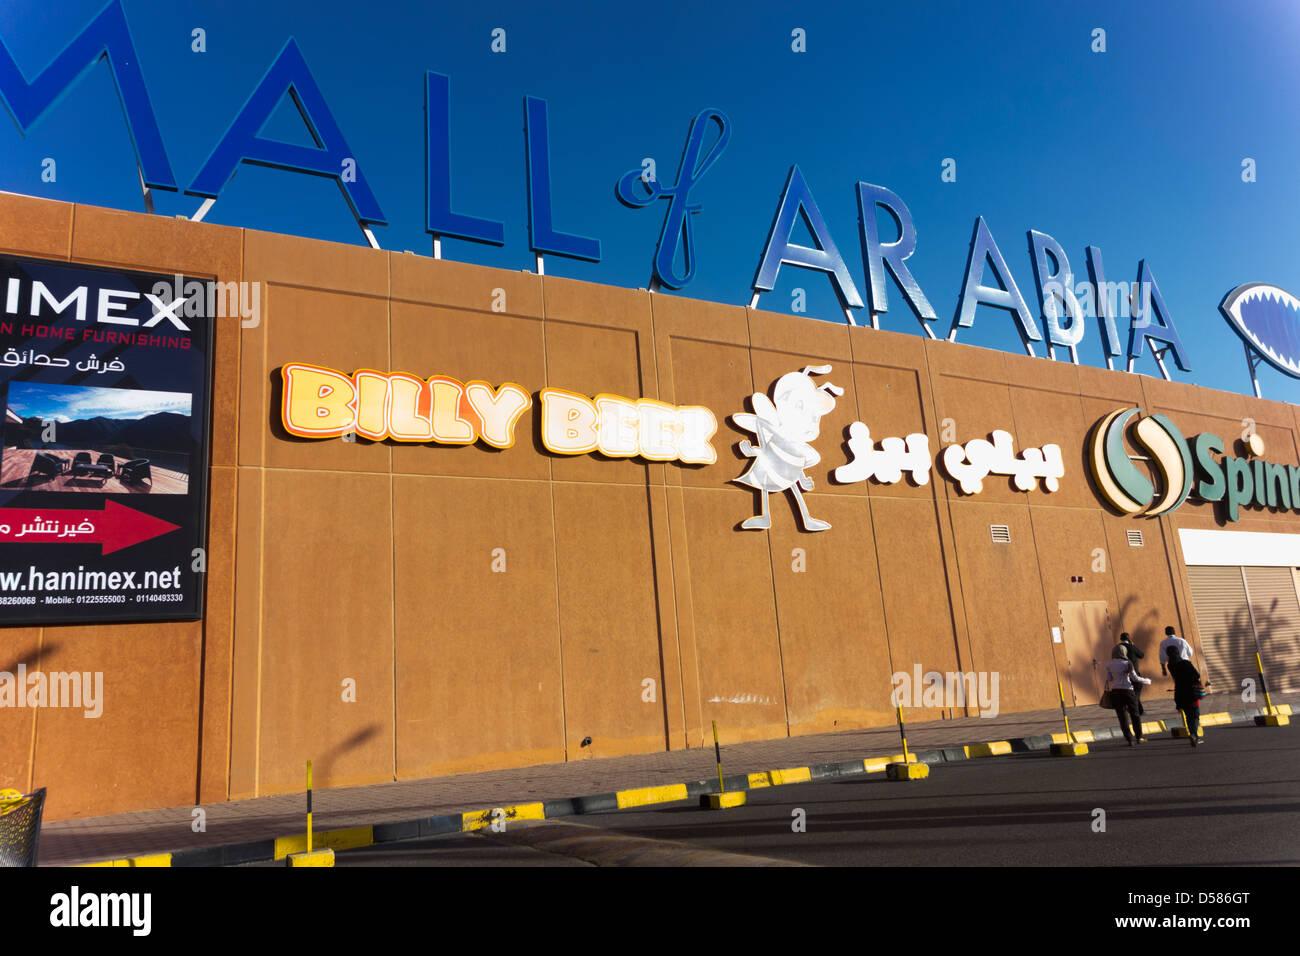 exterior, Mall of Arabia Cairo, Juhayna Square, 6th of October City, Giza, EGYPT - Stock Image